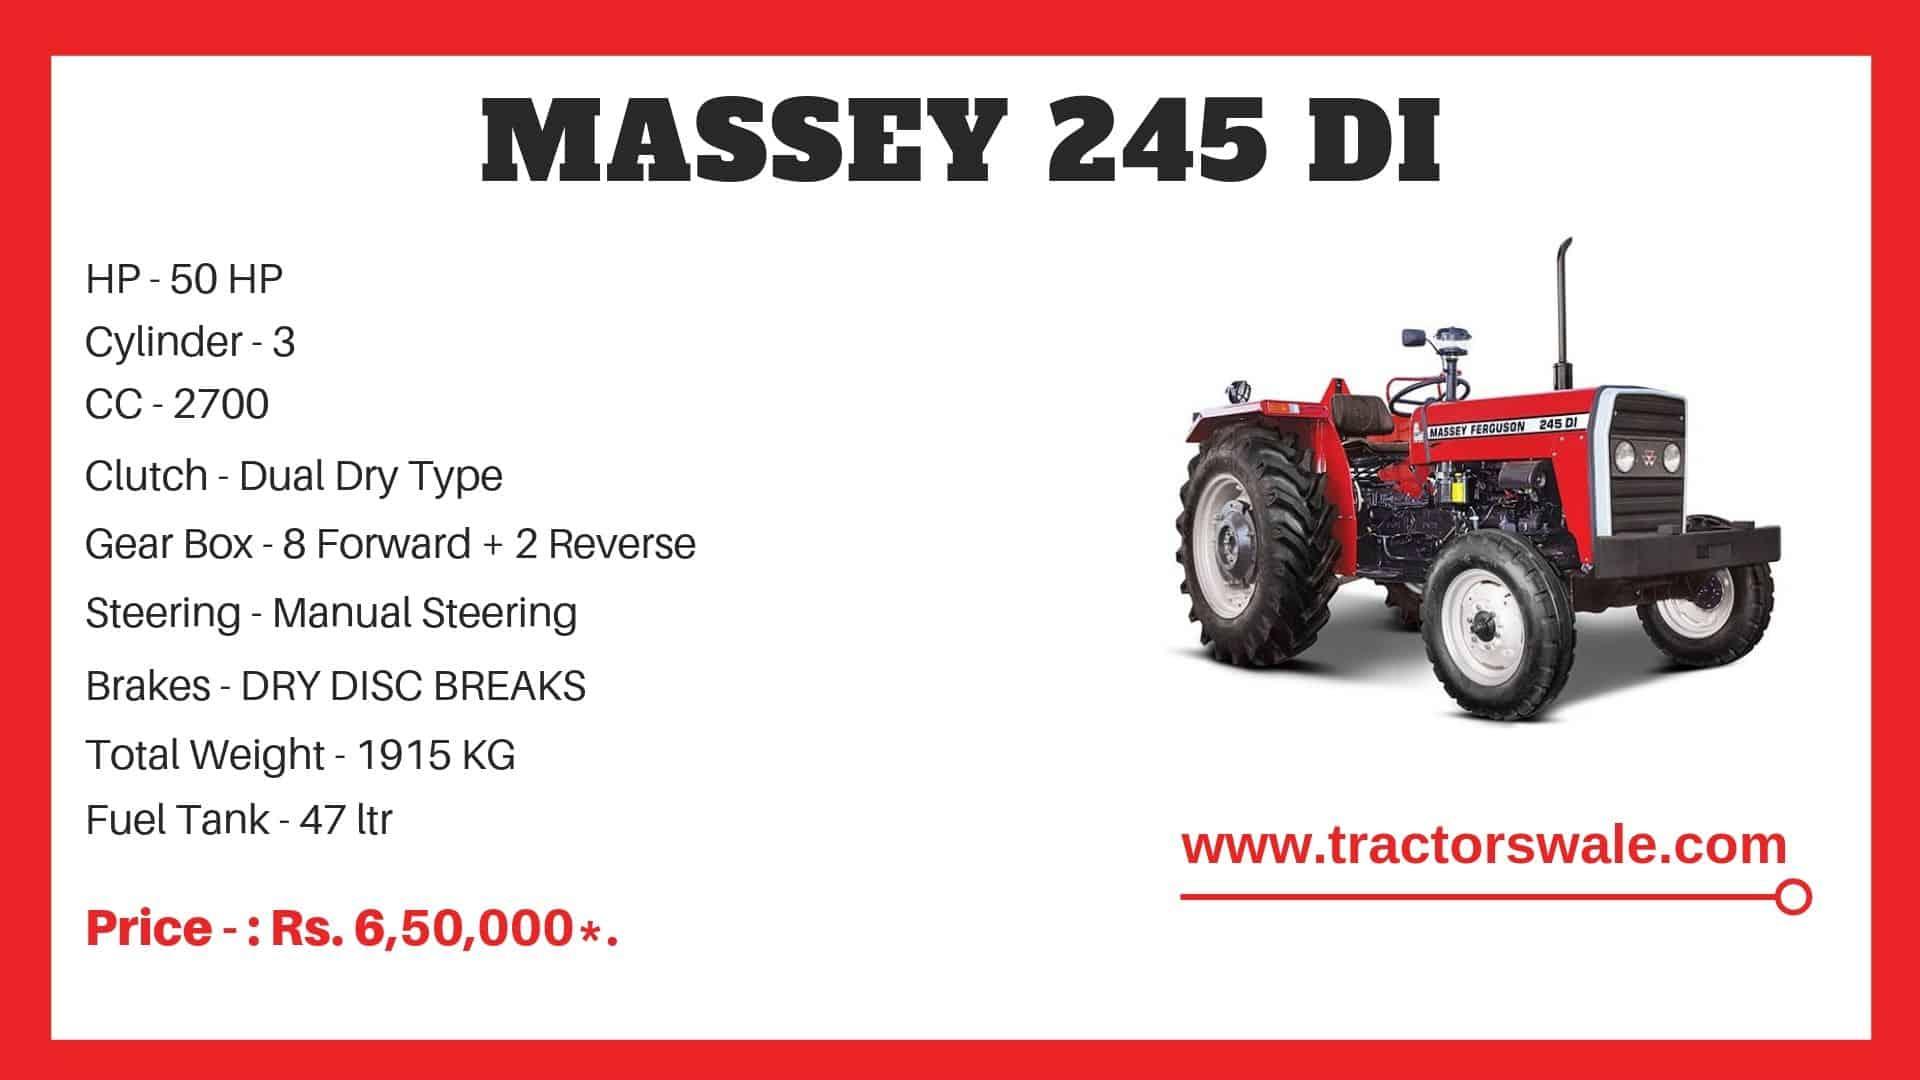 Massey Ferguson 245 DI Specifications